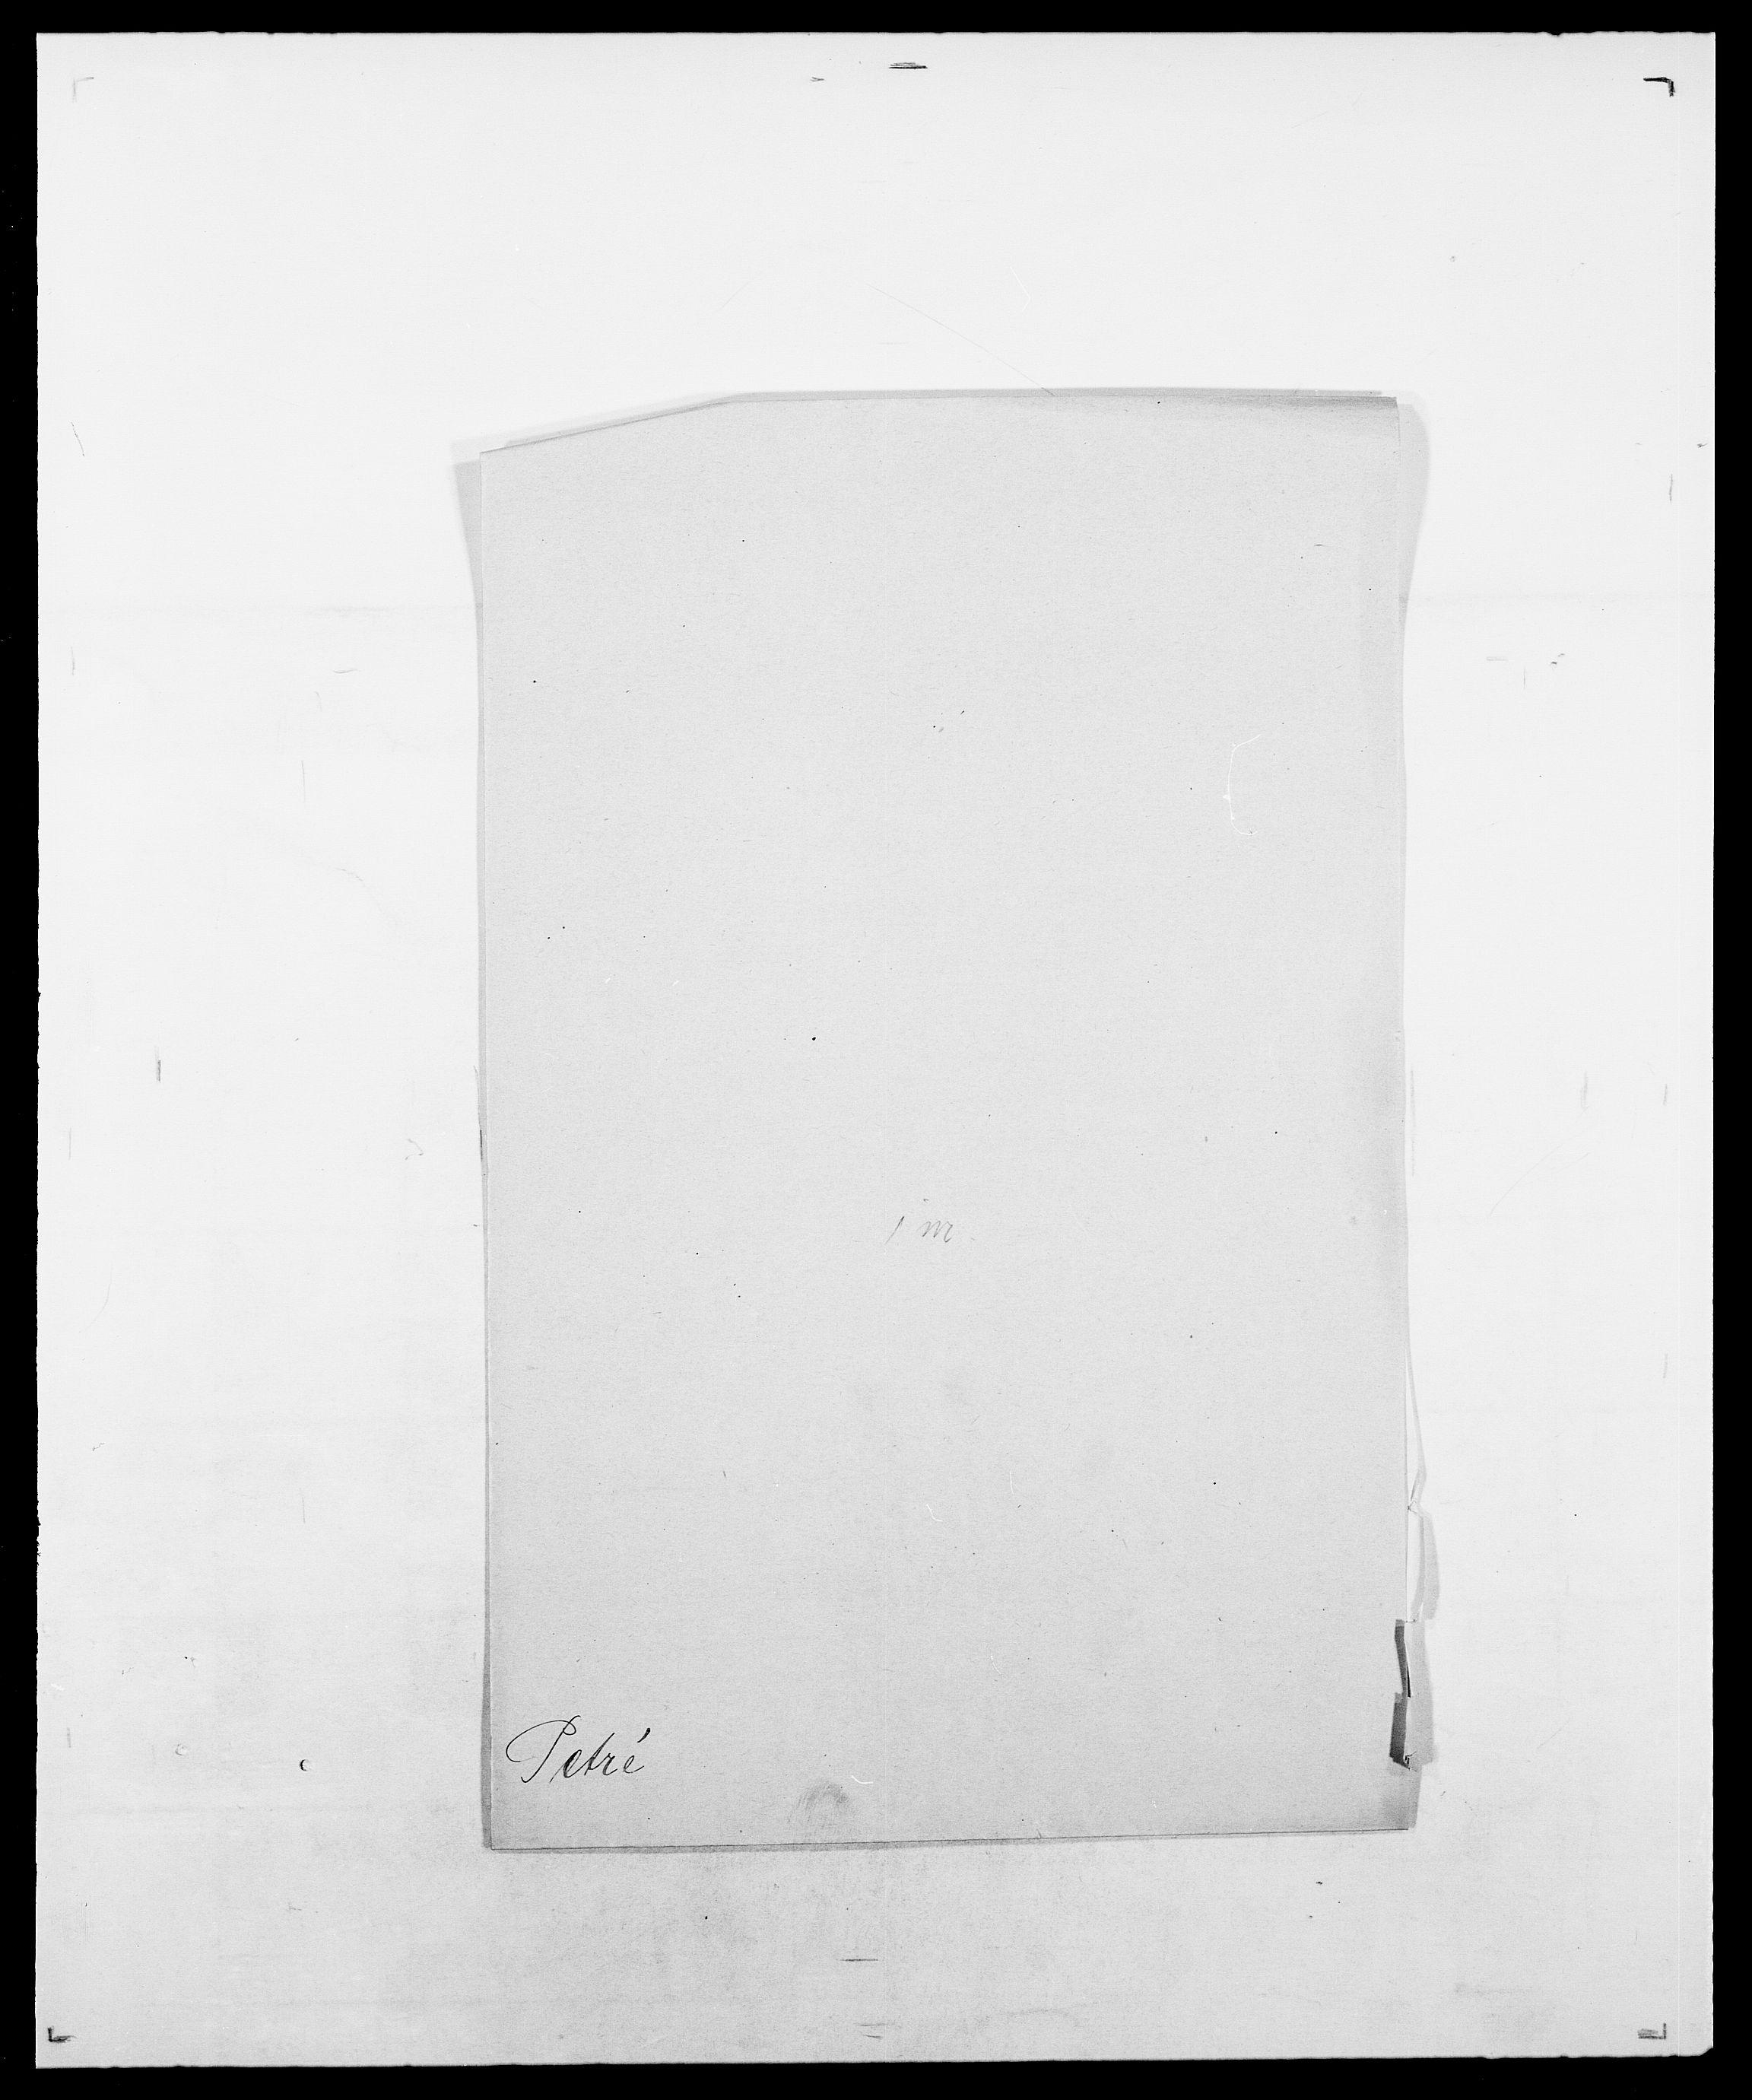 SAO, Delgobe, Charles Antoine - samling, D/Da/L0030: Paars - Pittelkov, s. 456